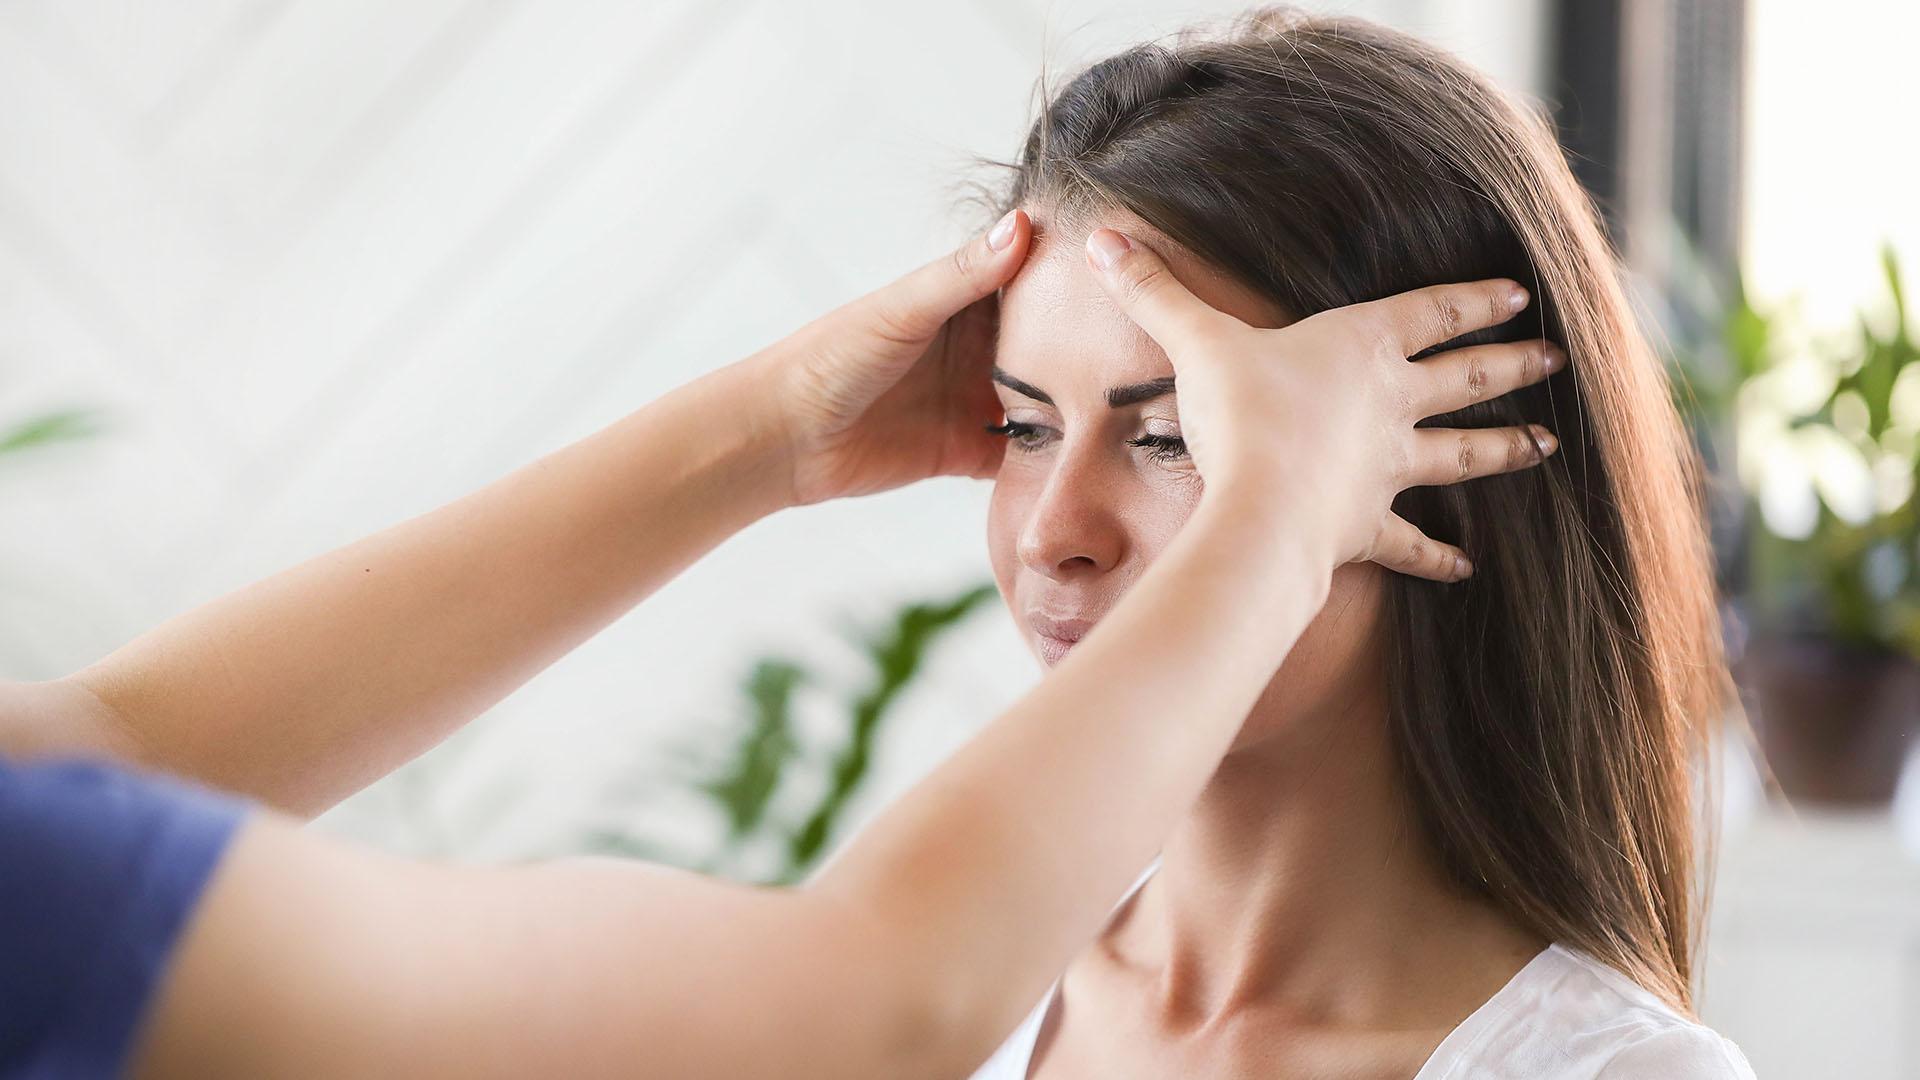 Deep Trigger Massage - Shoulder Pain Massage